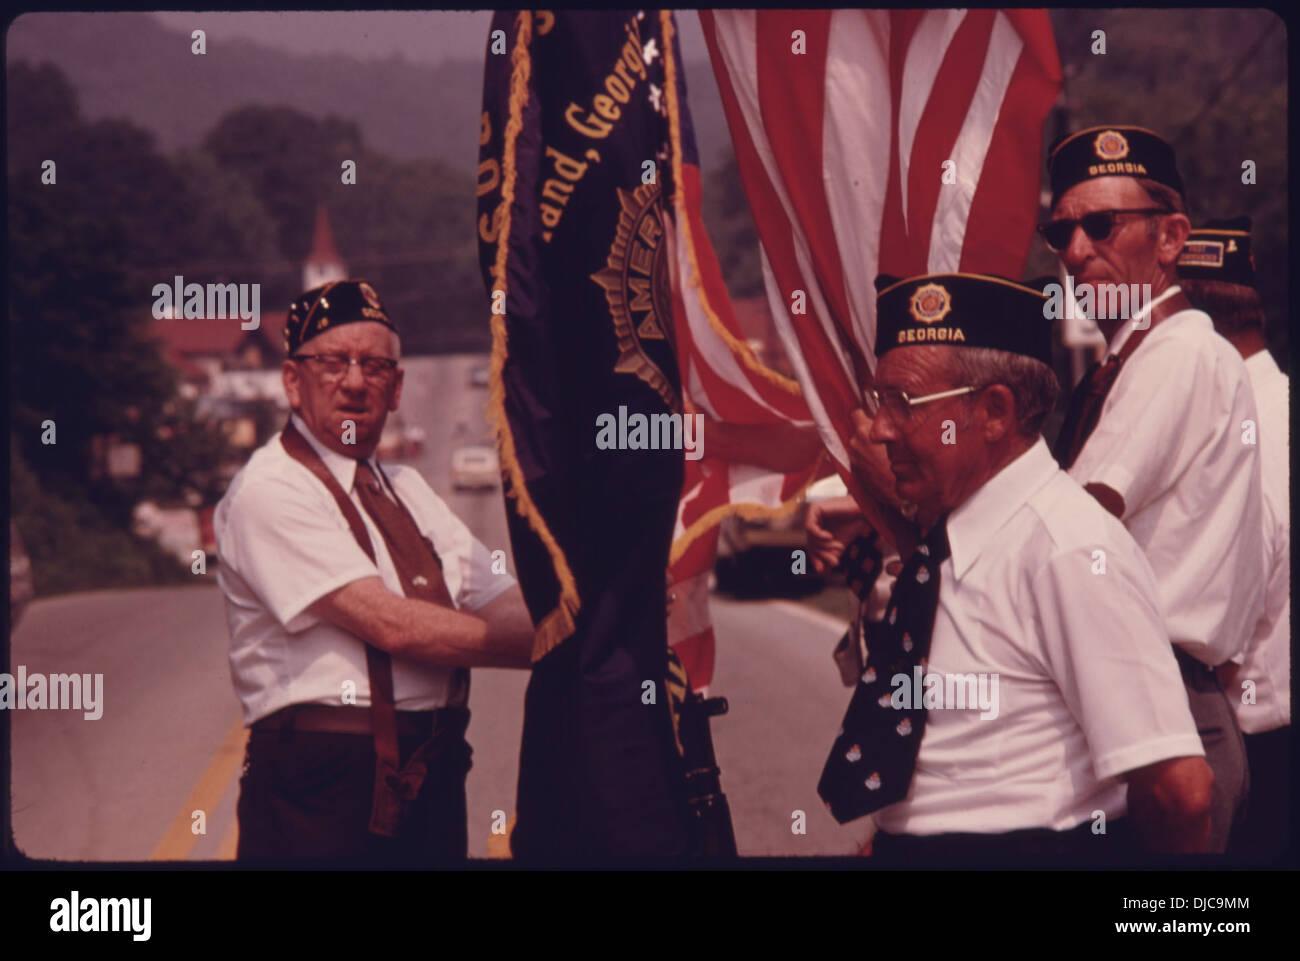 American Legion parade- 706-original - Stock Image